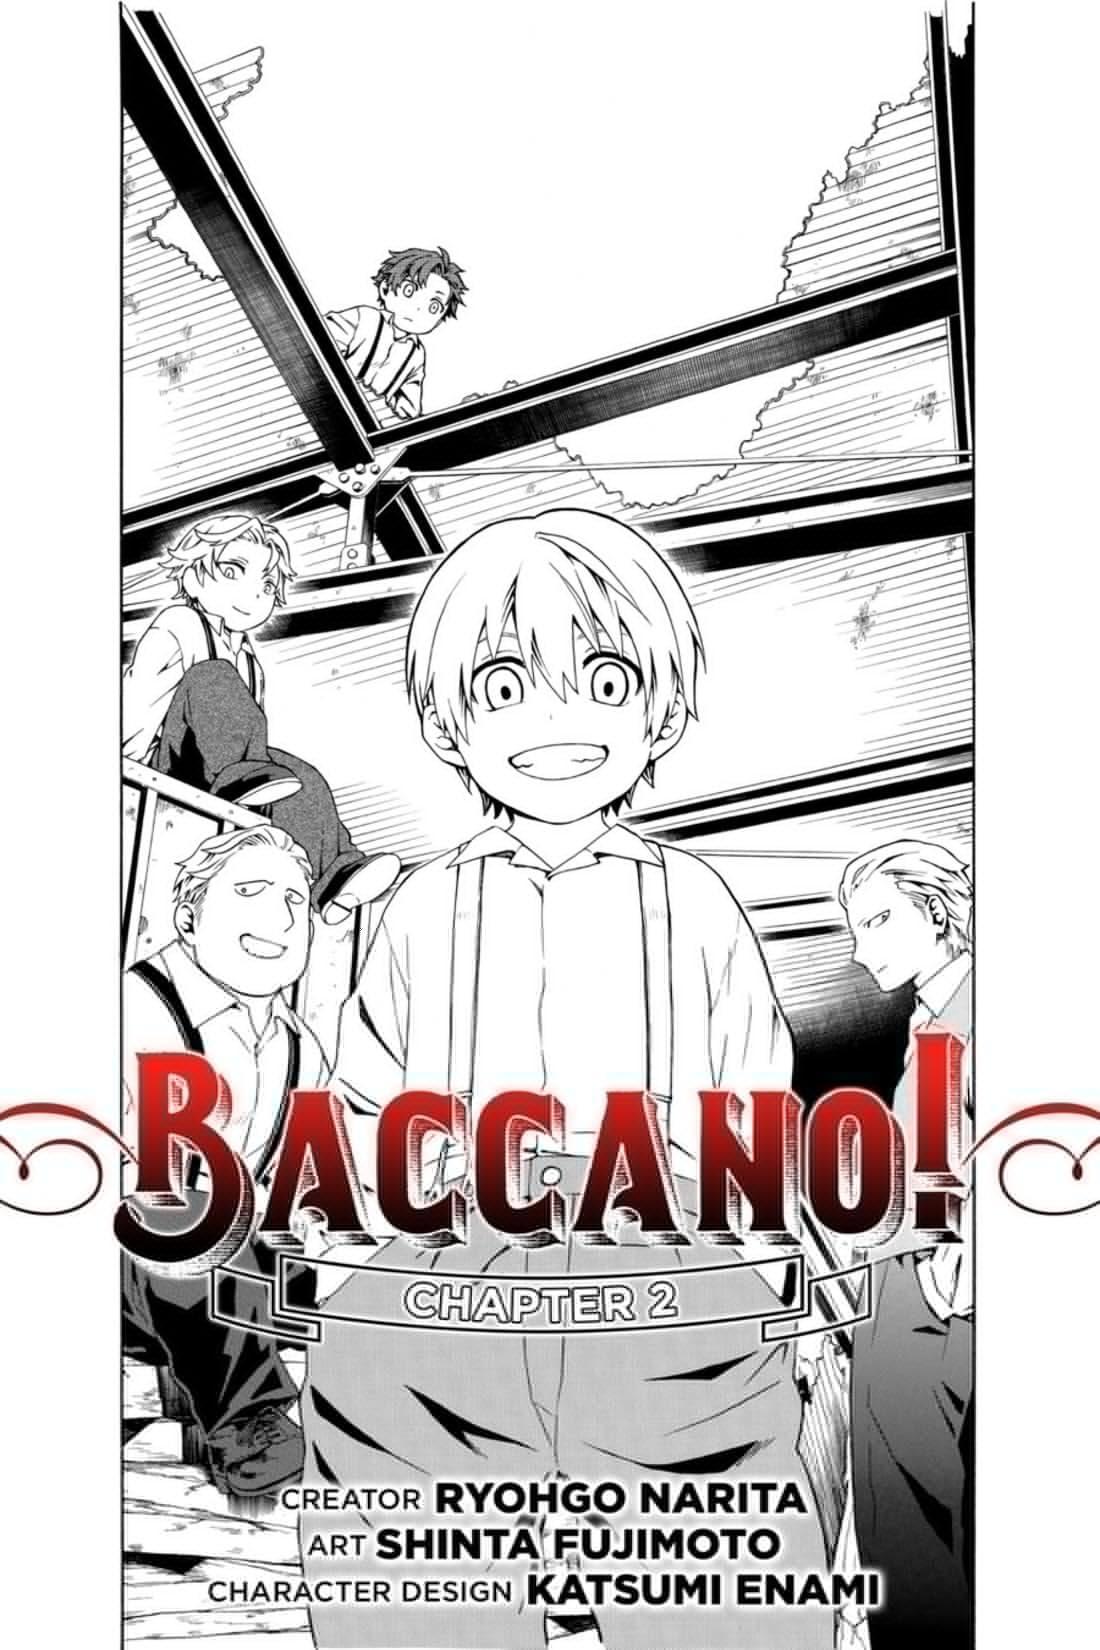 Baccano! #2